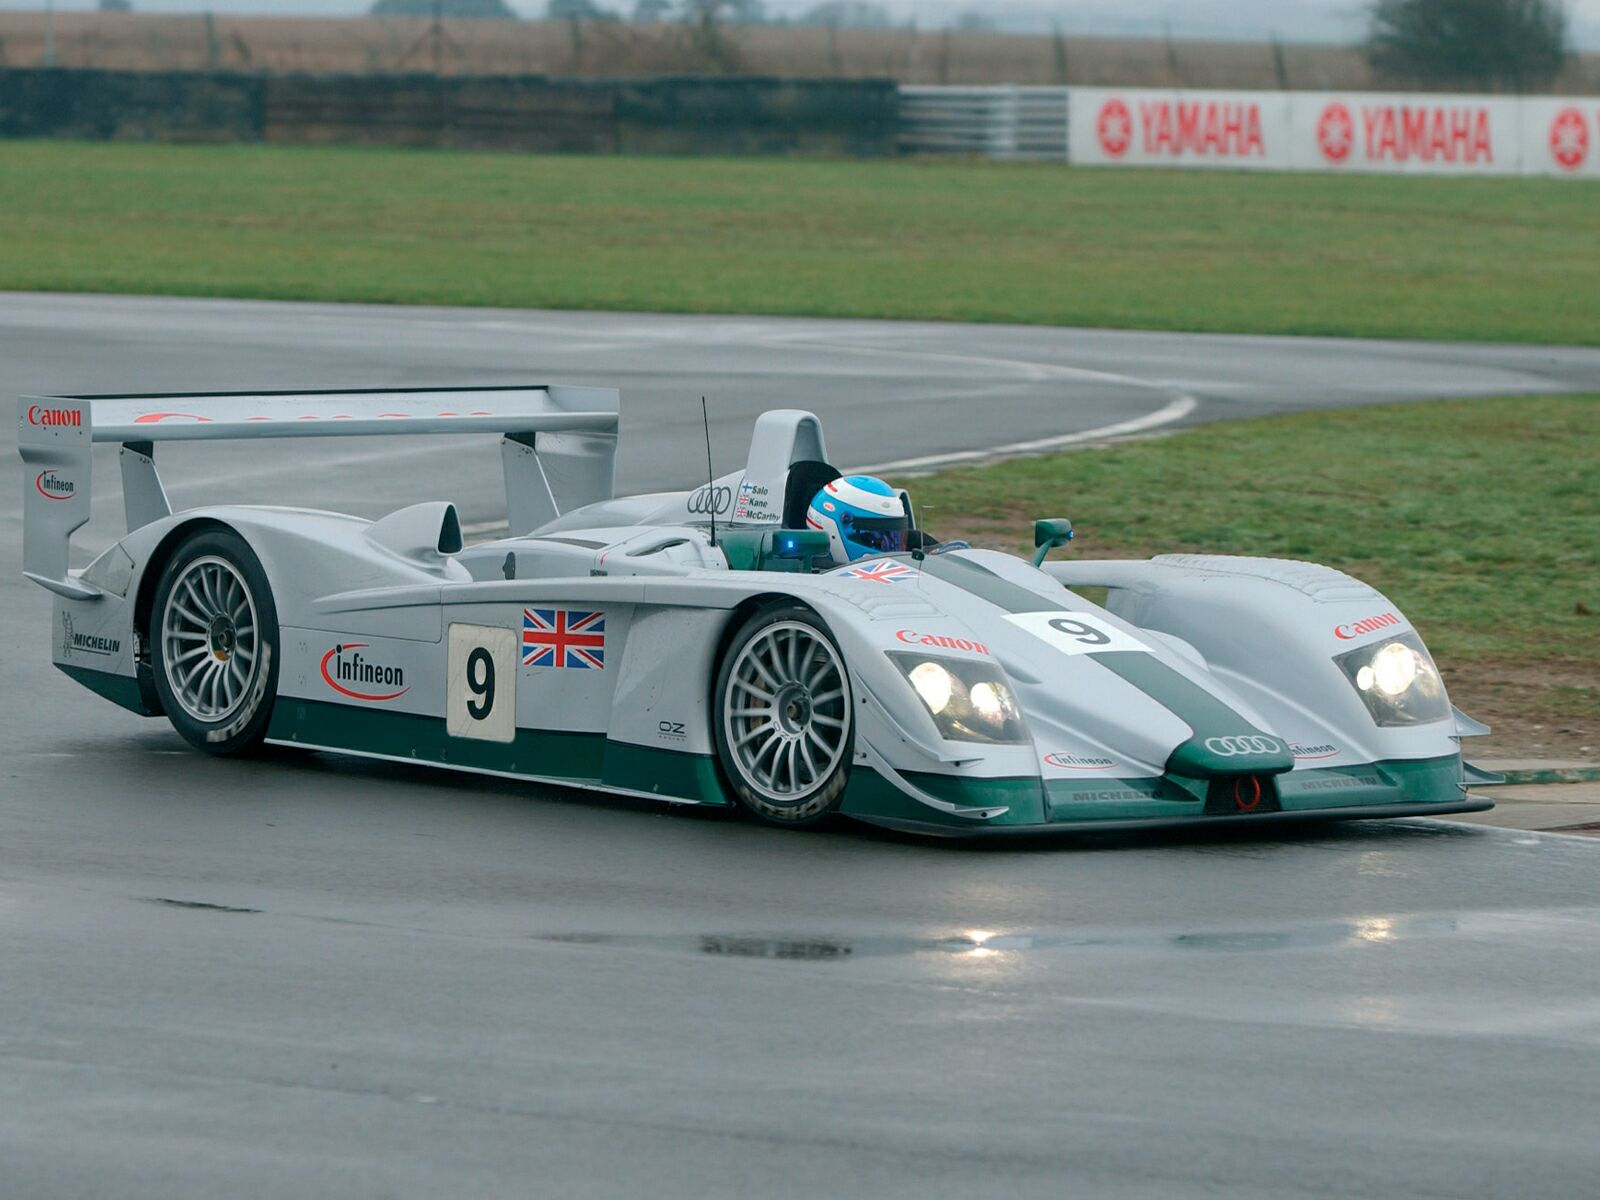 motorsports2 image